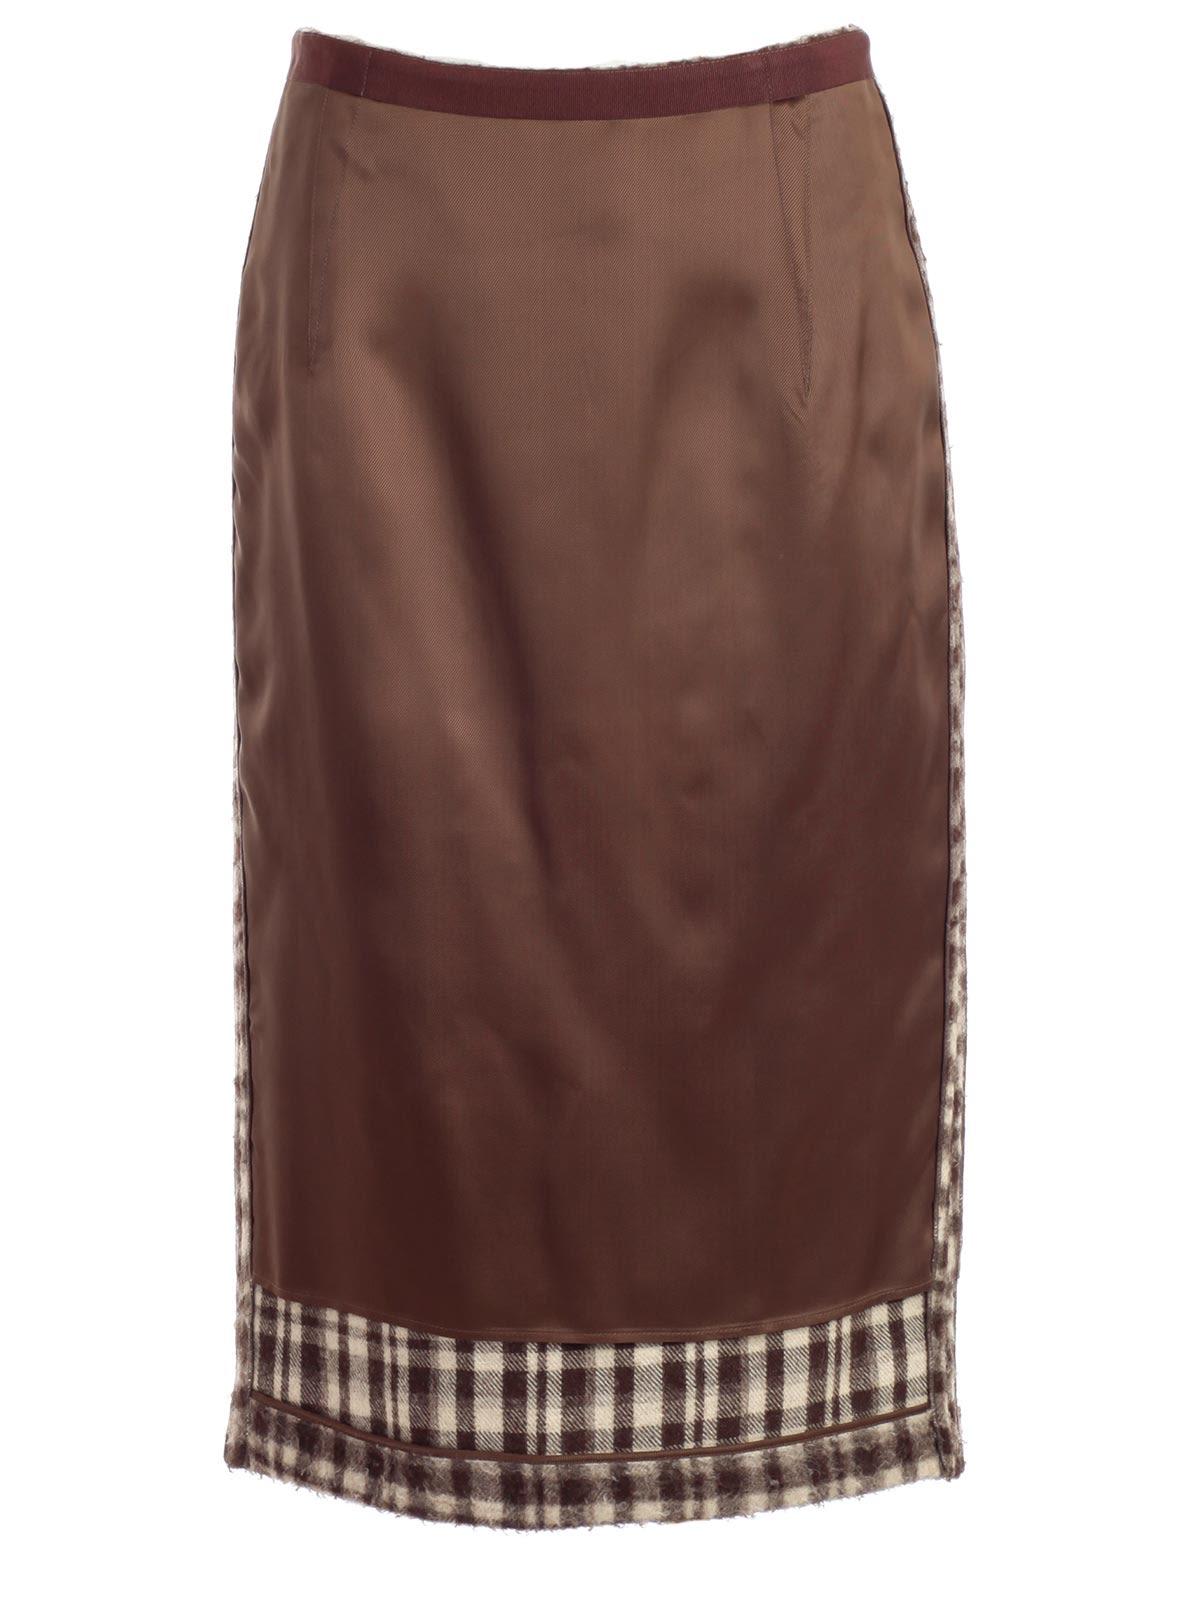 Erika Cavallini Check Insert Skirt